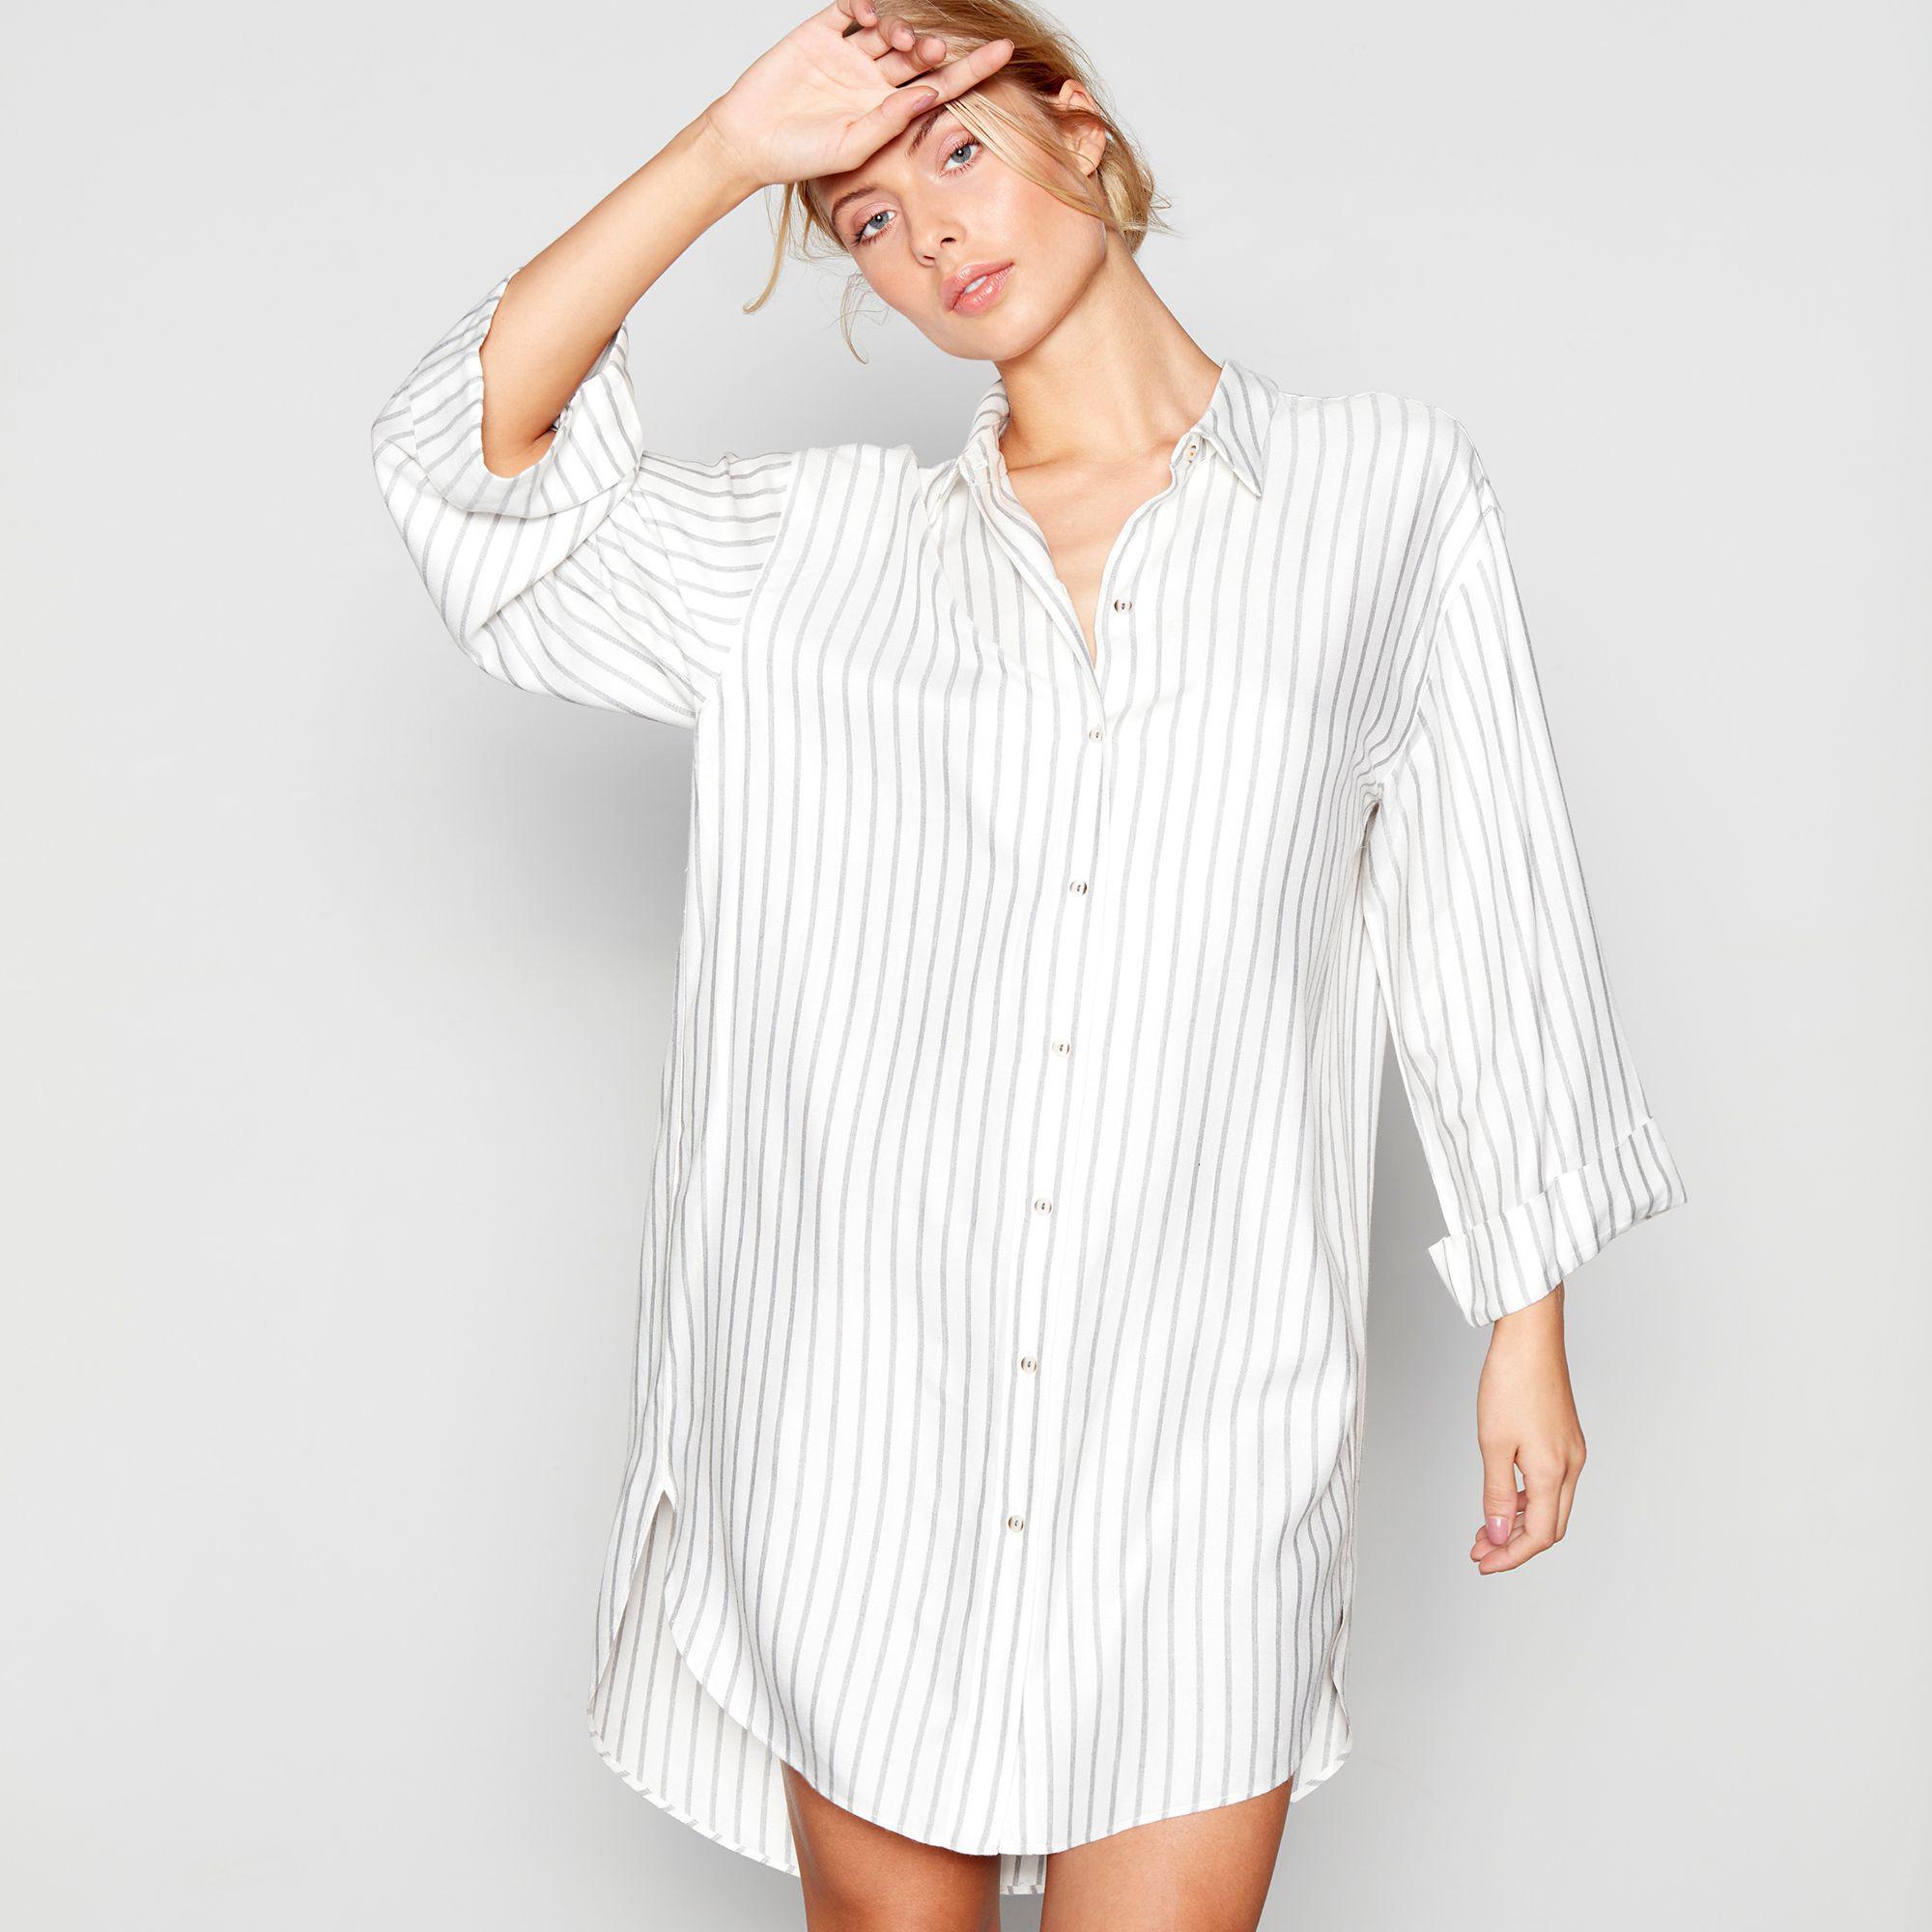 4f76941f043 J By Jasper Conran Cream Stripe Print  hygge  Nightshirt in White - Lyst